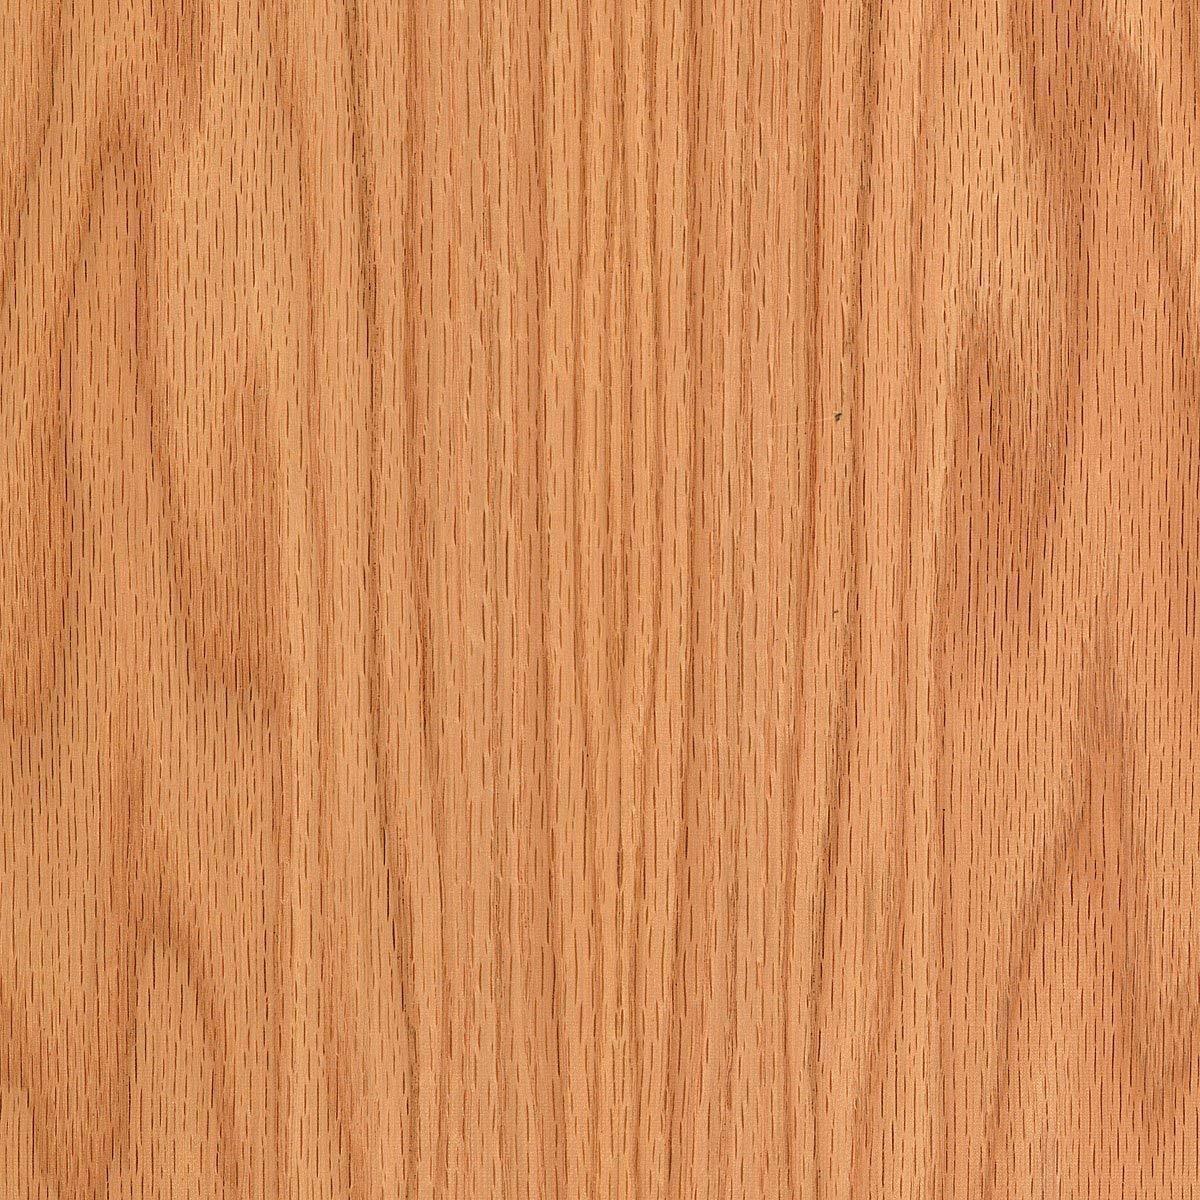 2440 x 1220 x 9mm White Oak MDF